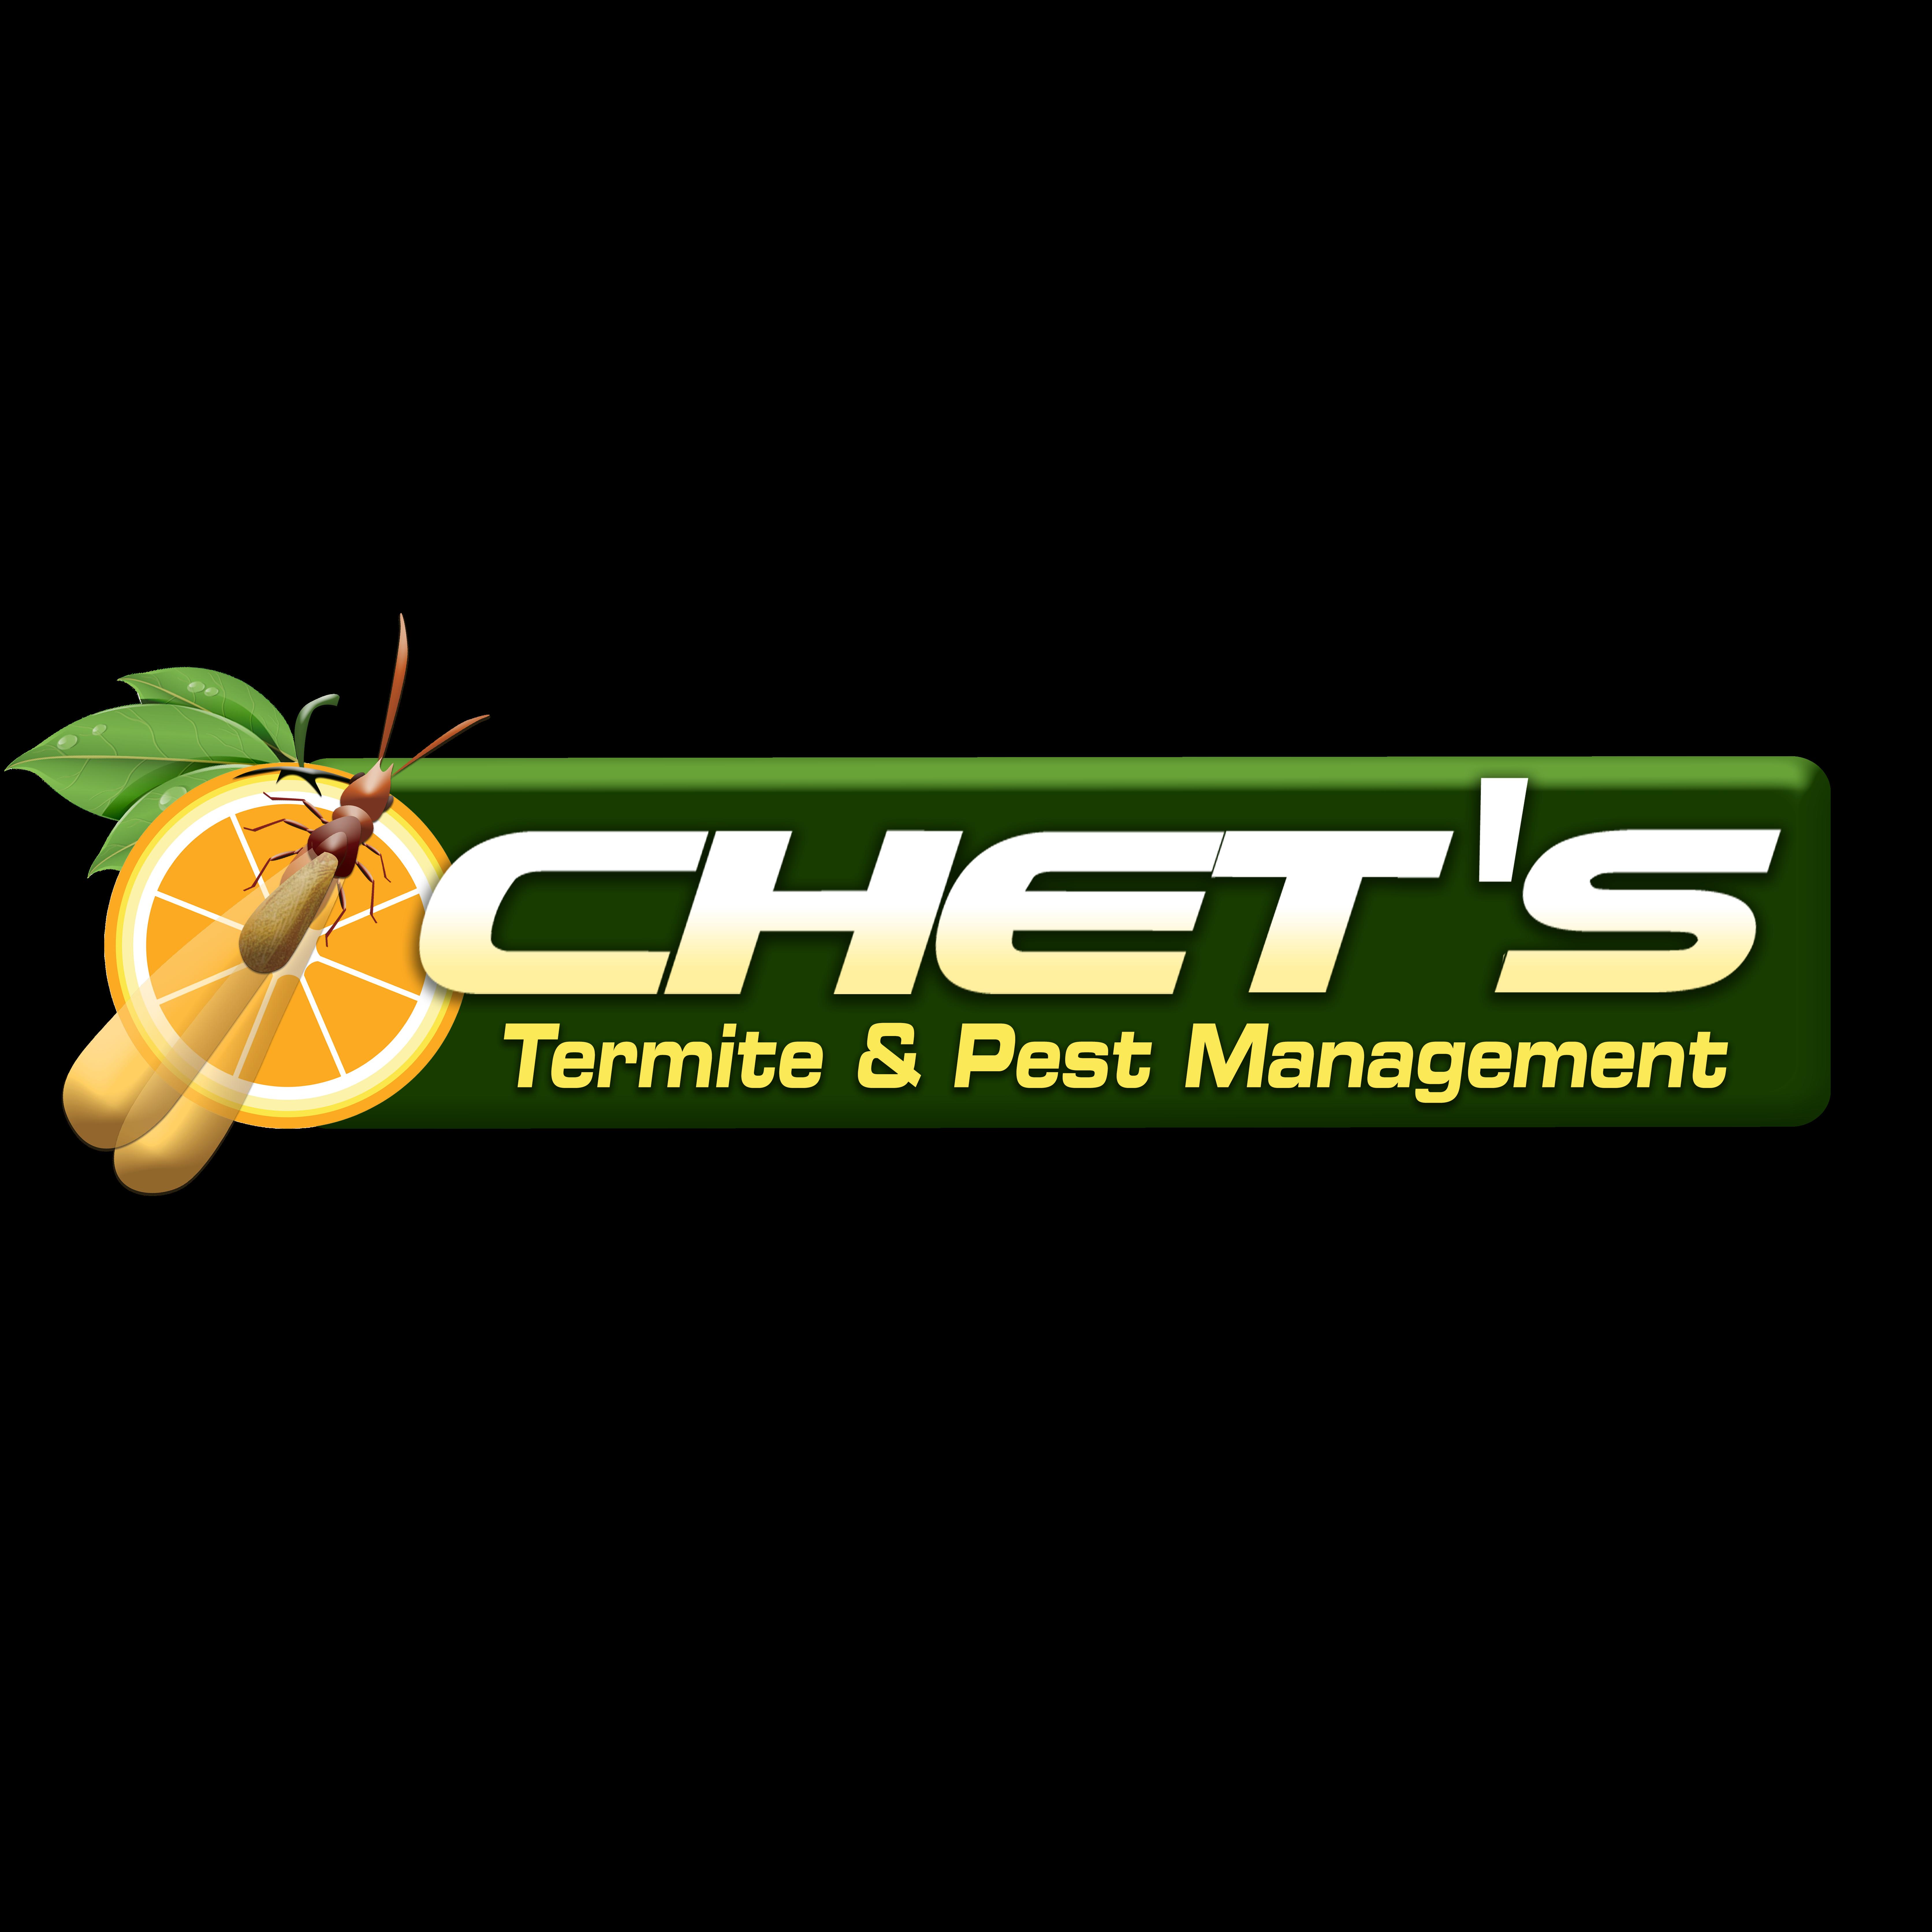 Chet's Termite & Pest Management, Inc.